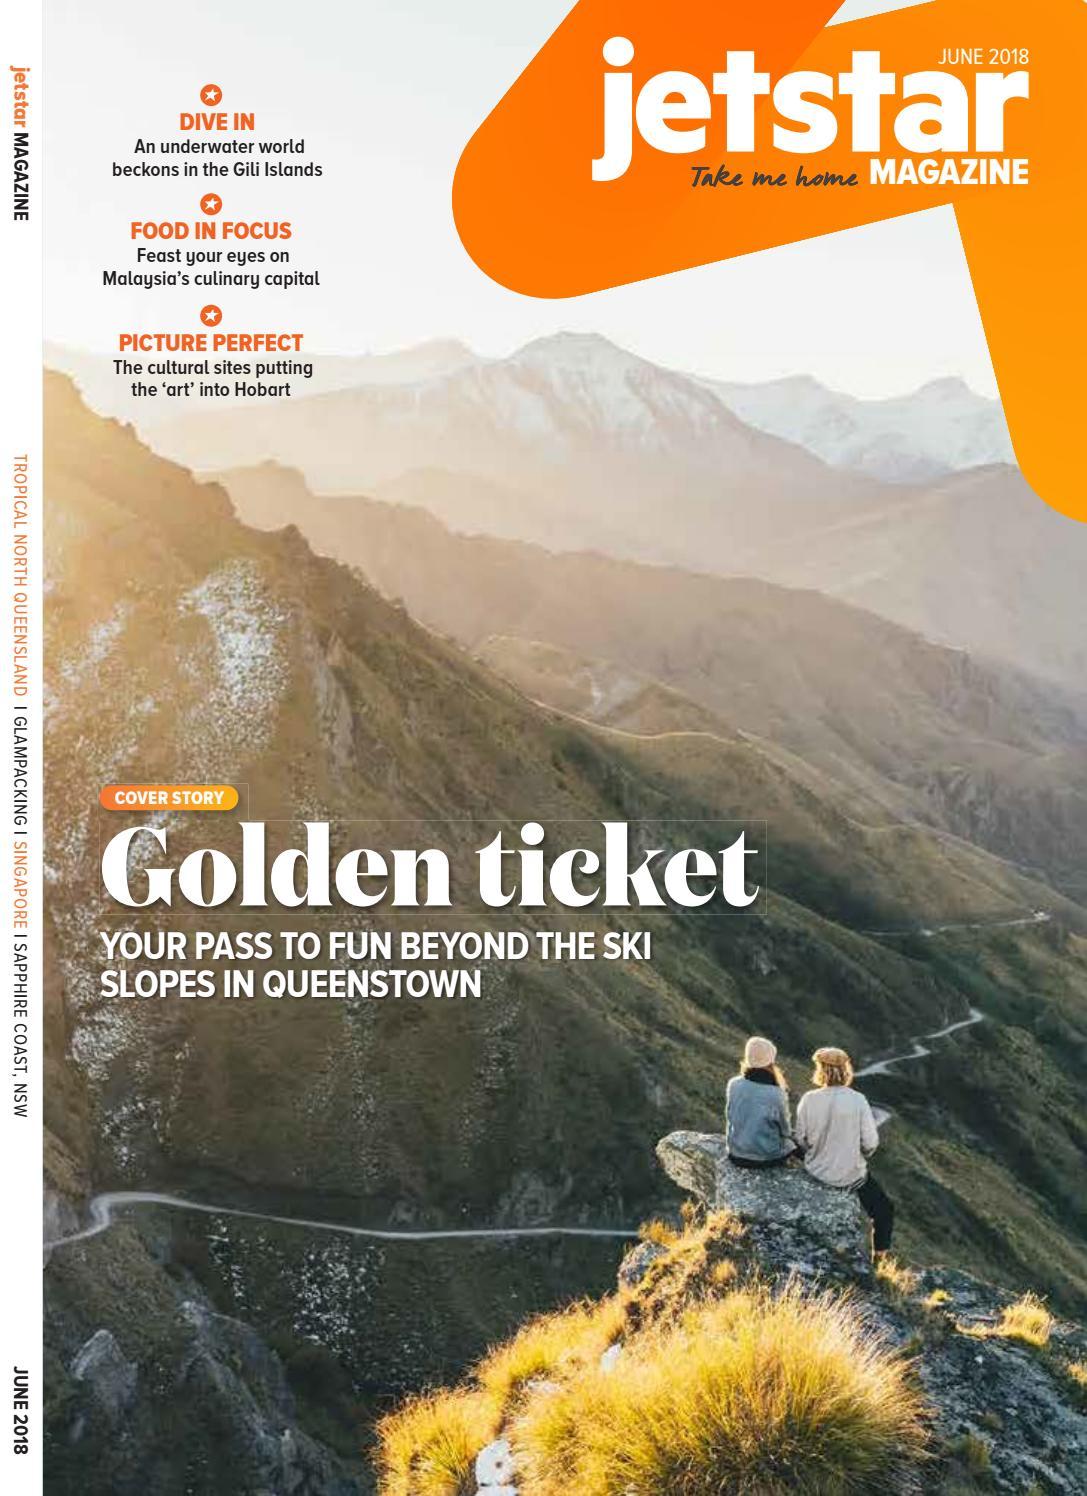 Jetstar June 2018 Magazine By Hgm Issuu Head Ampamp Shoulder Sampo Clean And Balanced 480 Ml